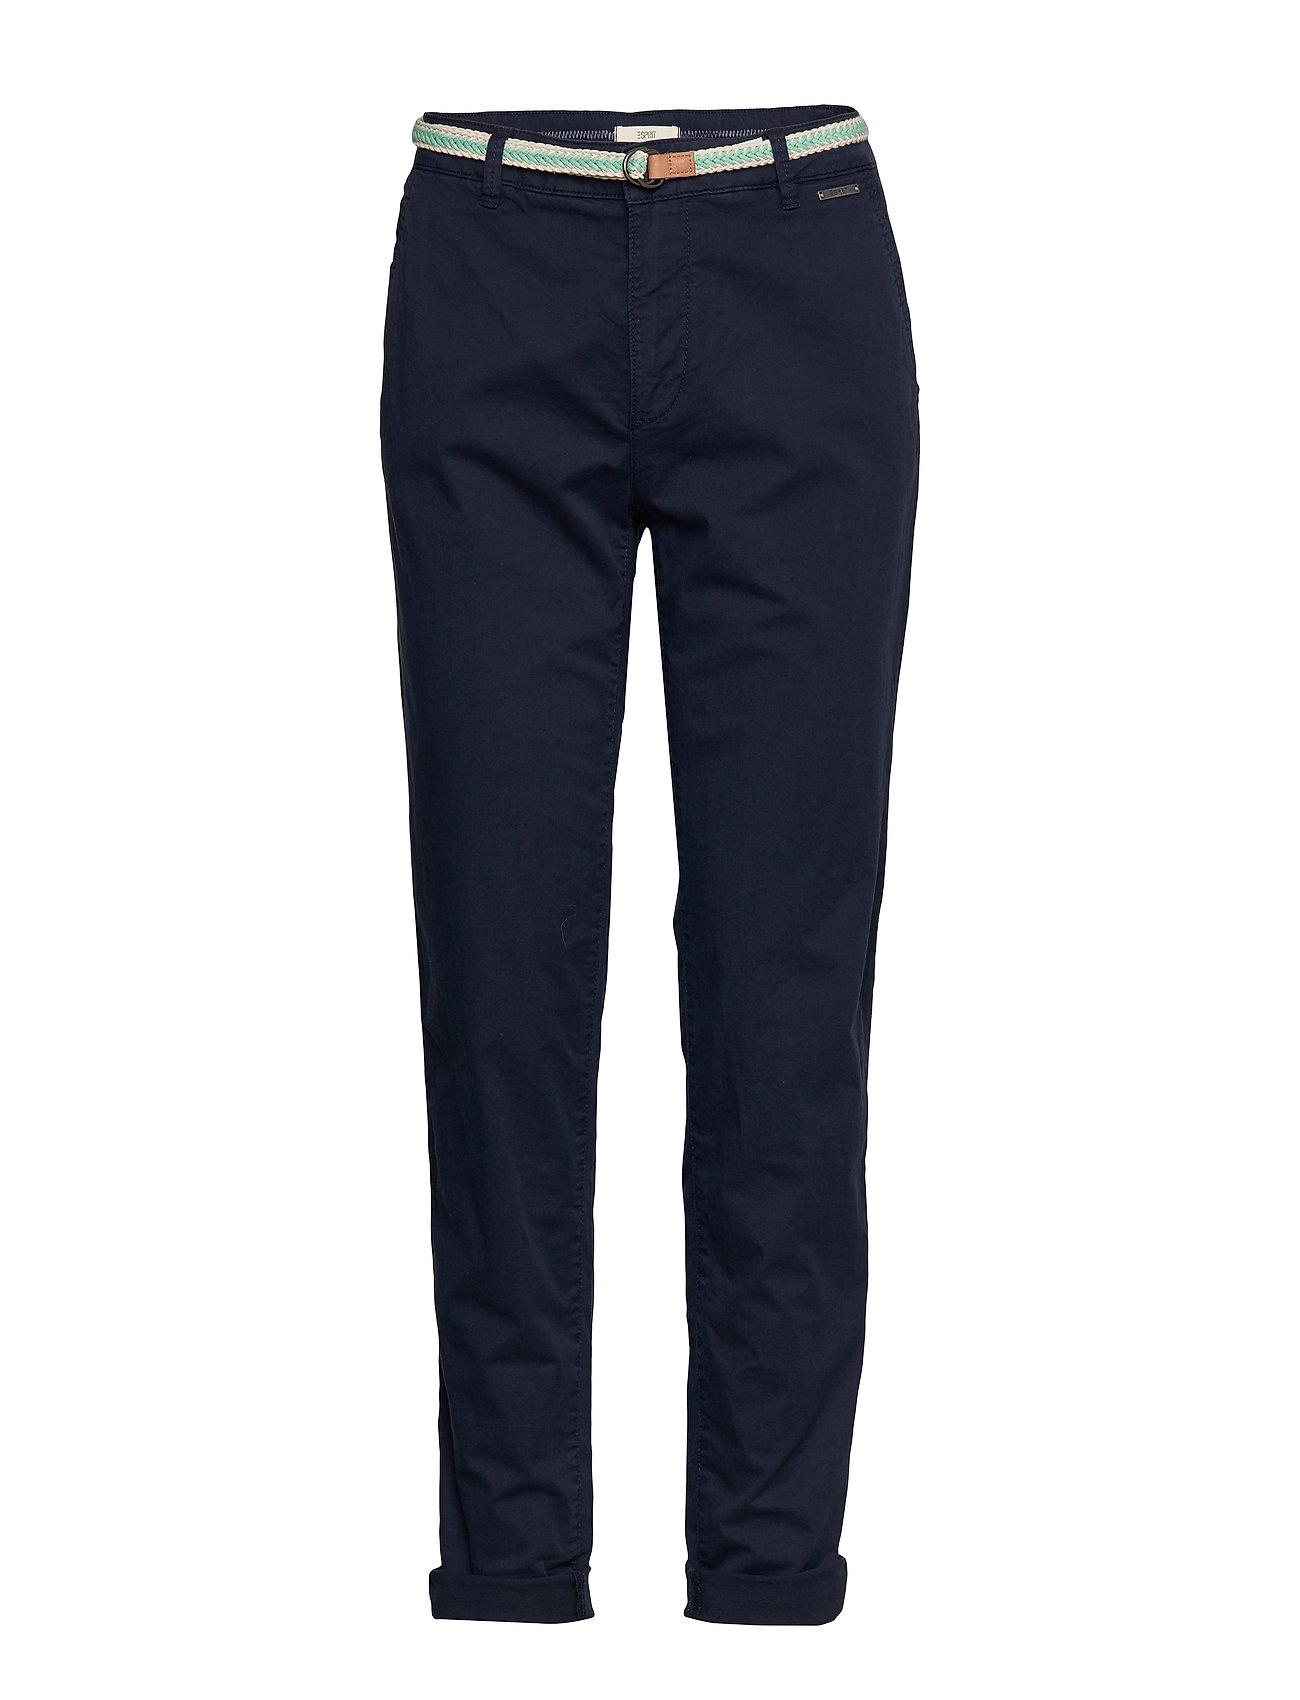 Esprit Casual Pants woven - NAVY